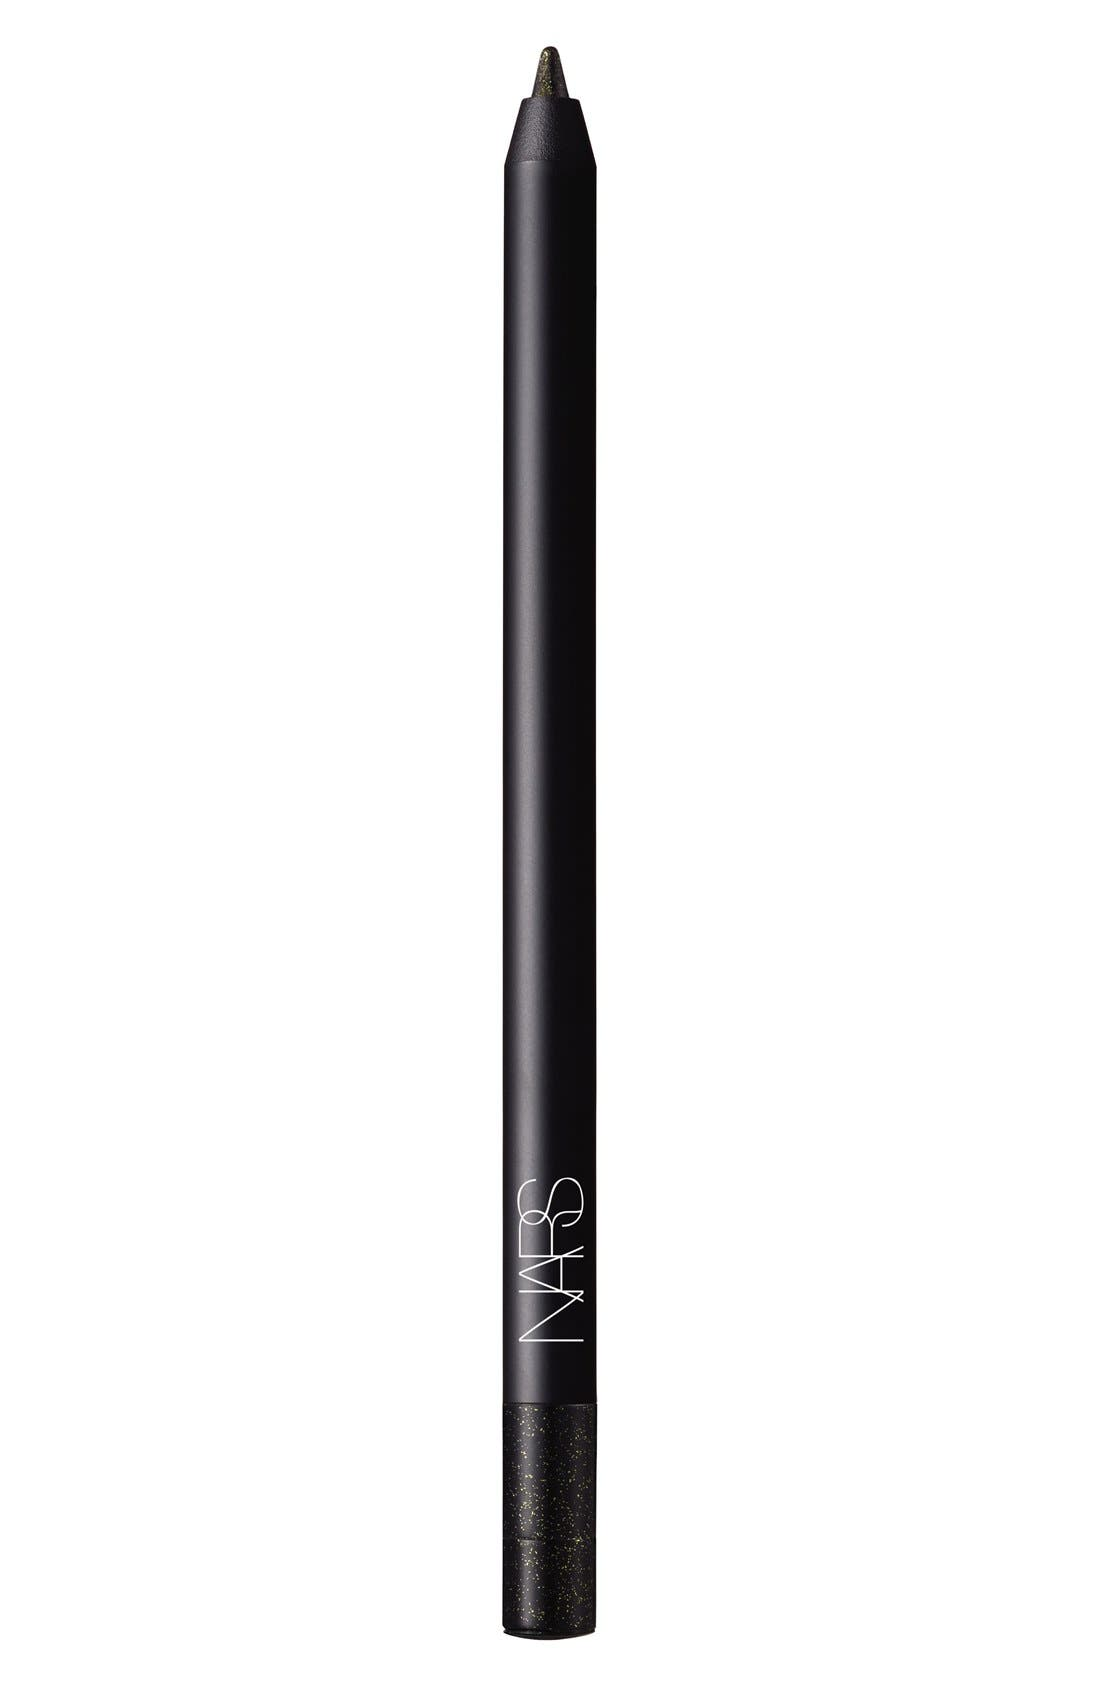 NARS Night Series Eyeliner